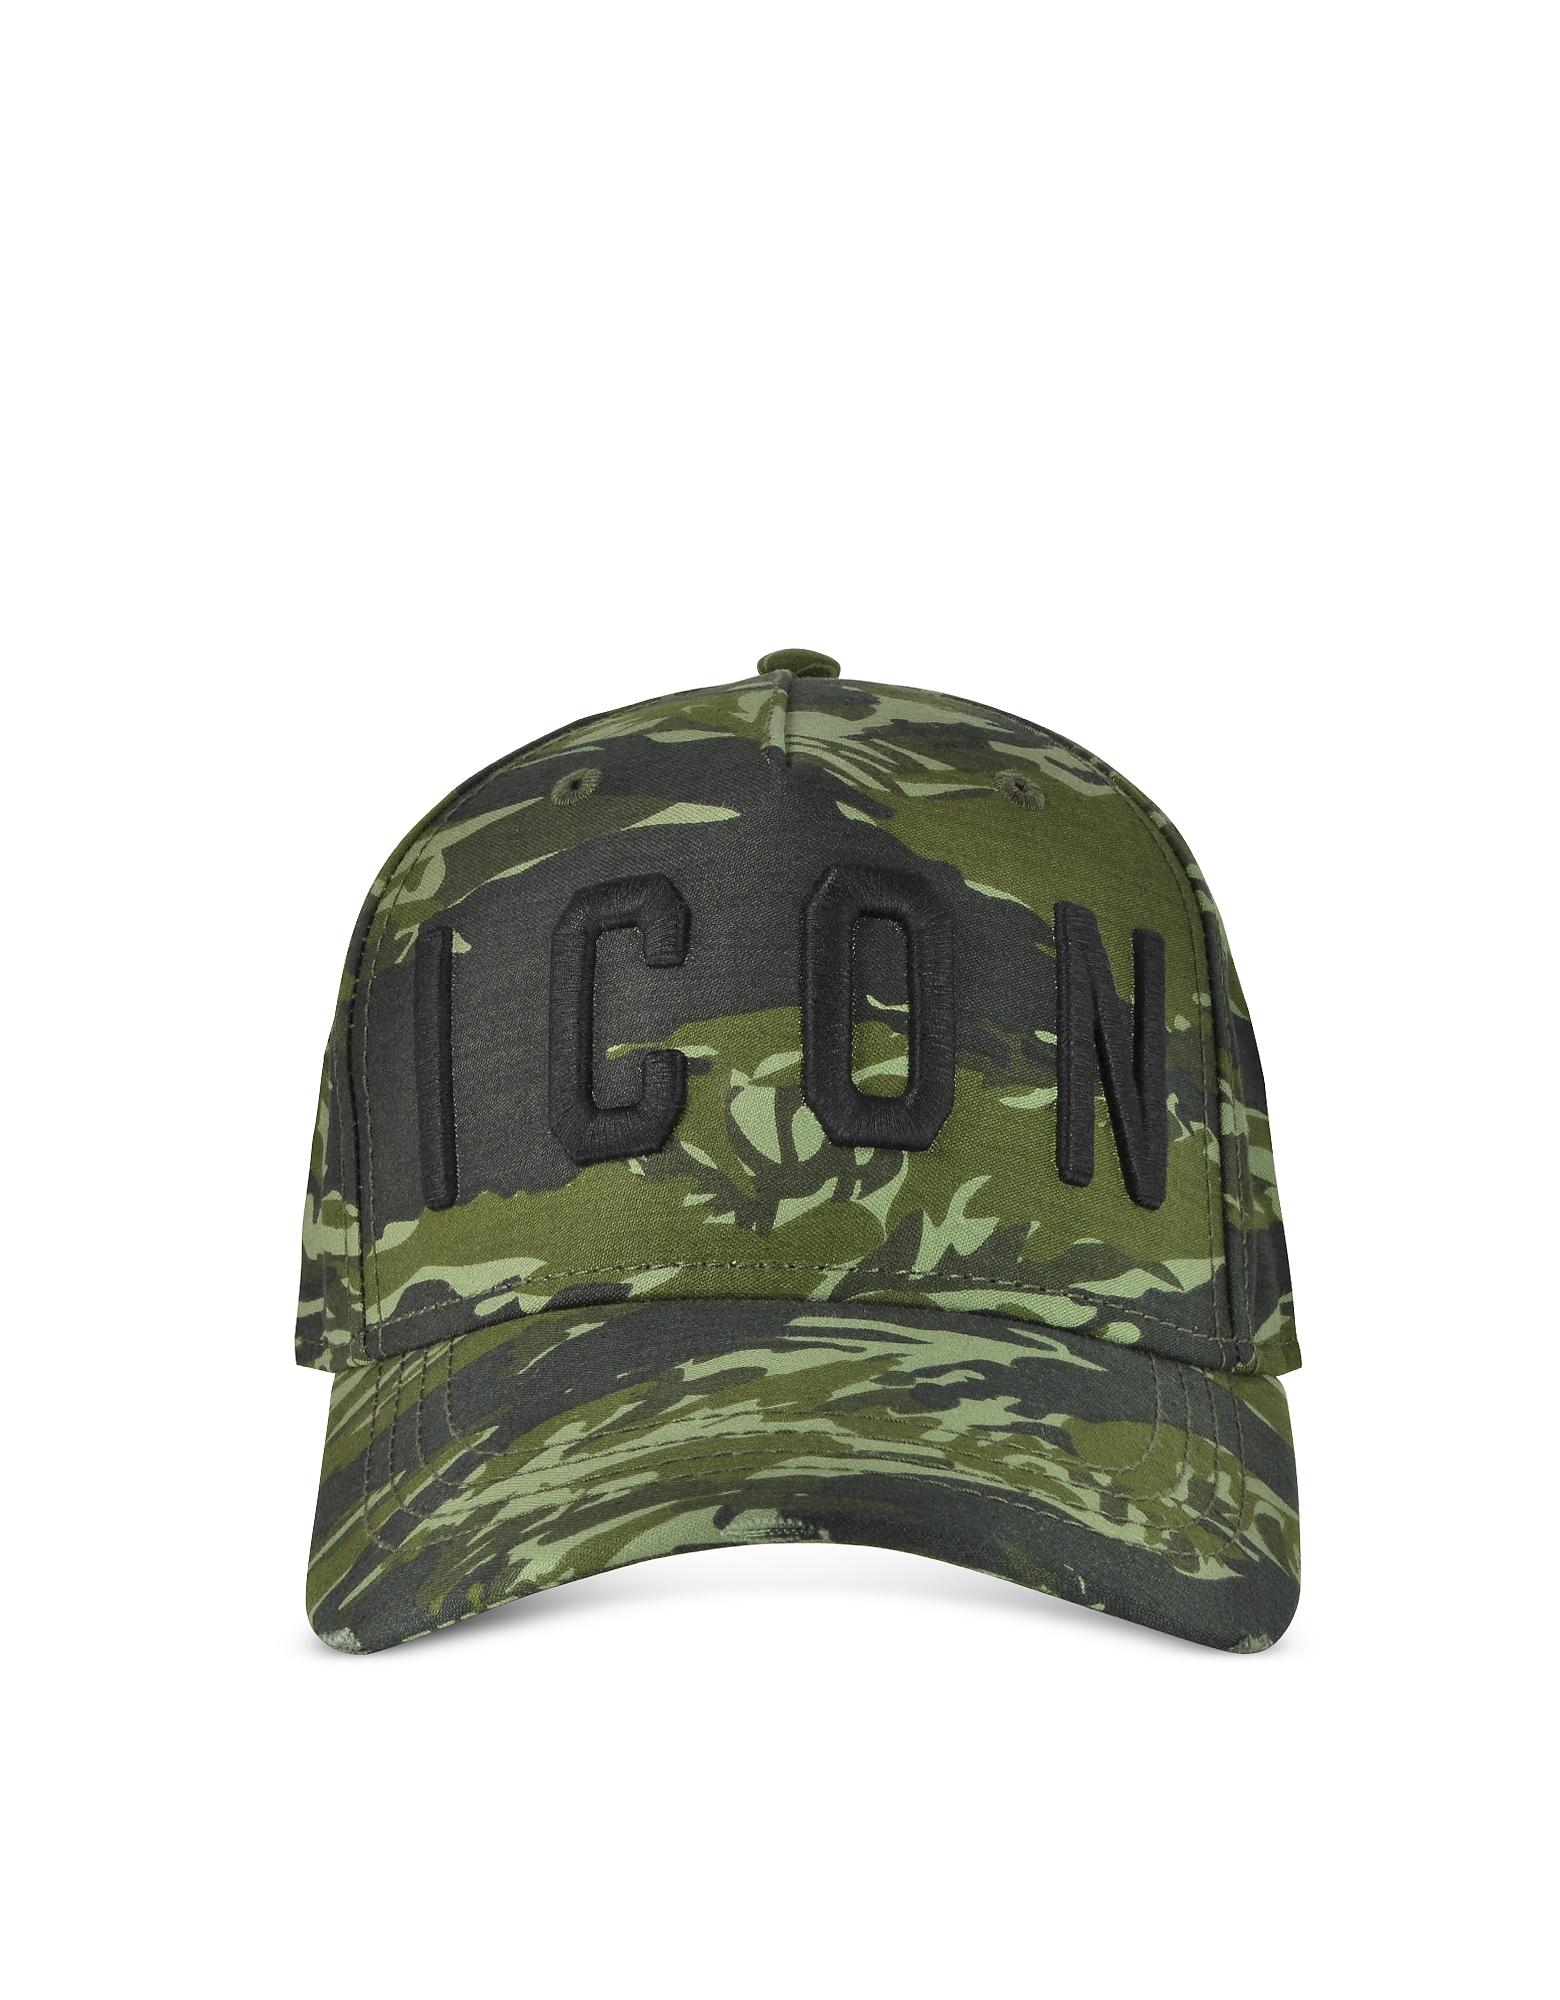 DSquared2 Men's Hats, Embroidered Icon Logo Camouflage Gabardine Baseball Cap